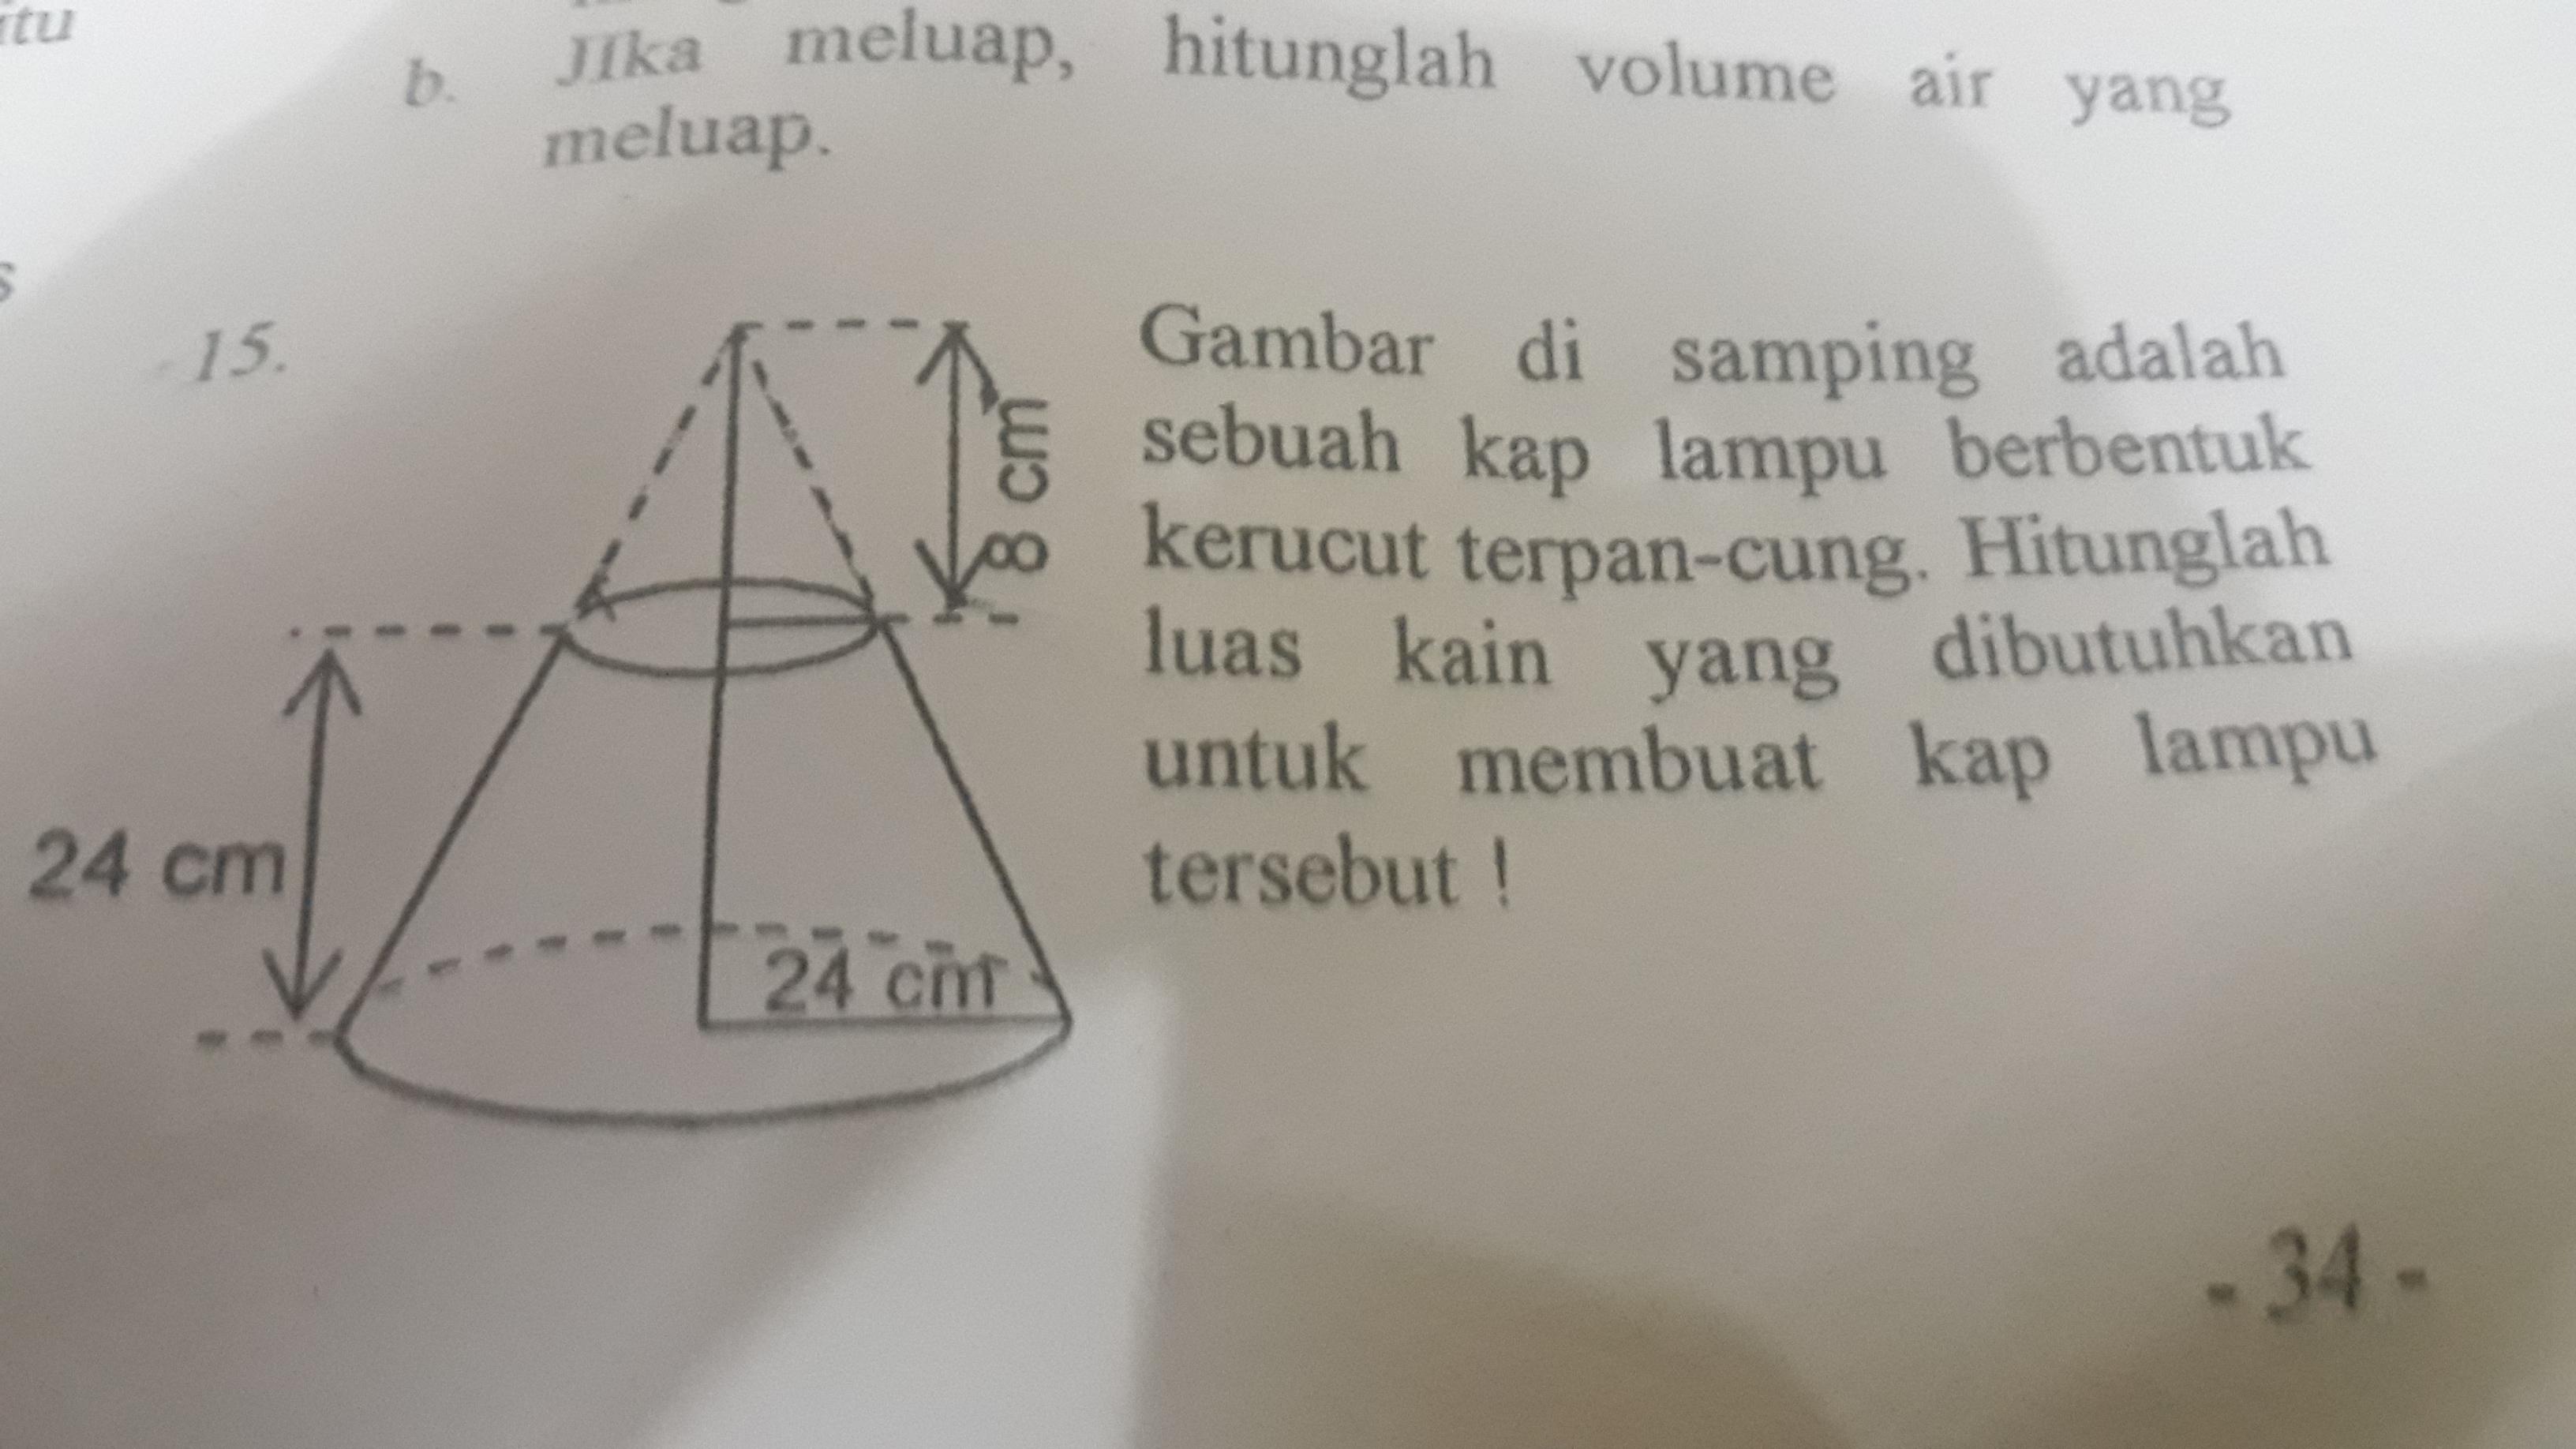 Gambar disamping adalah sebuah kap lampu berbentuk kerucut ...